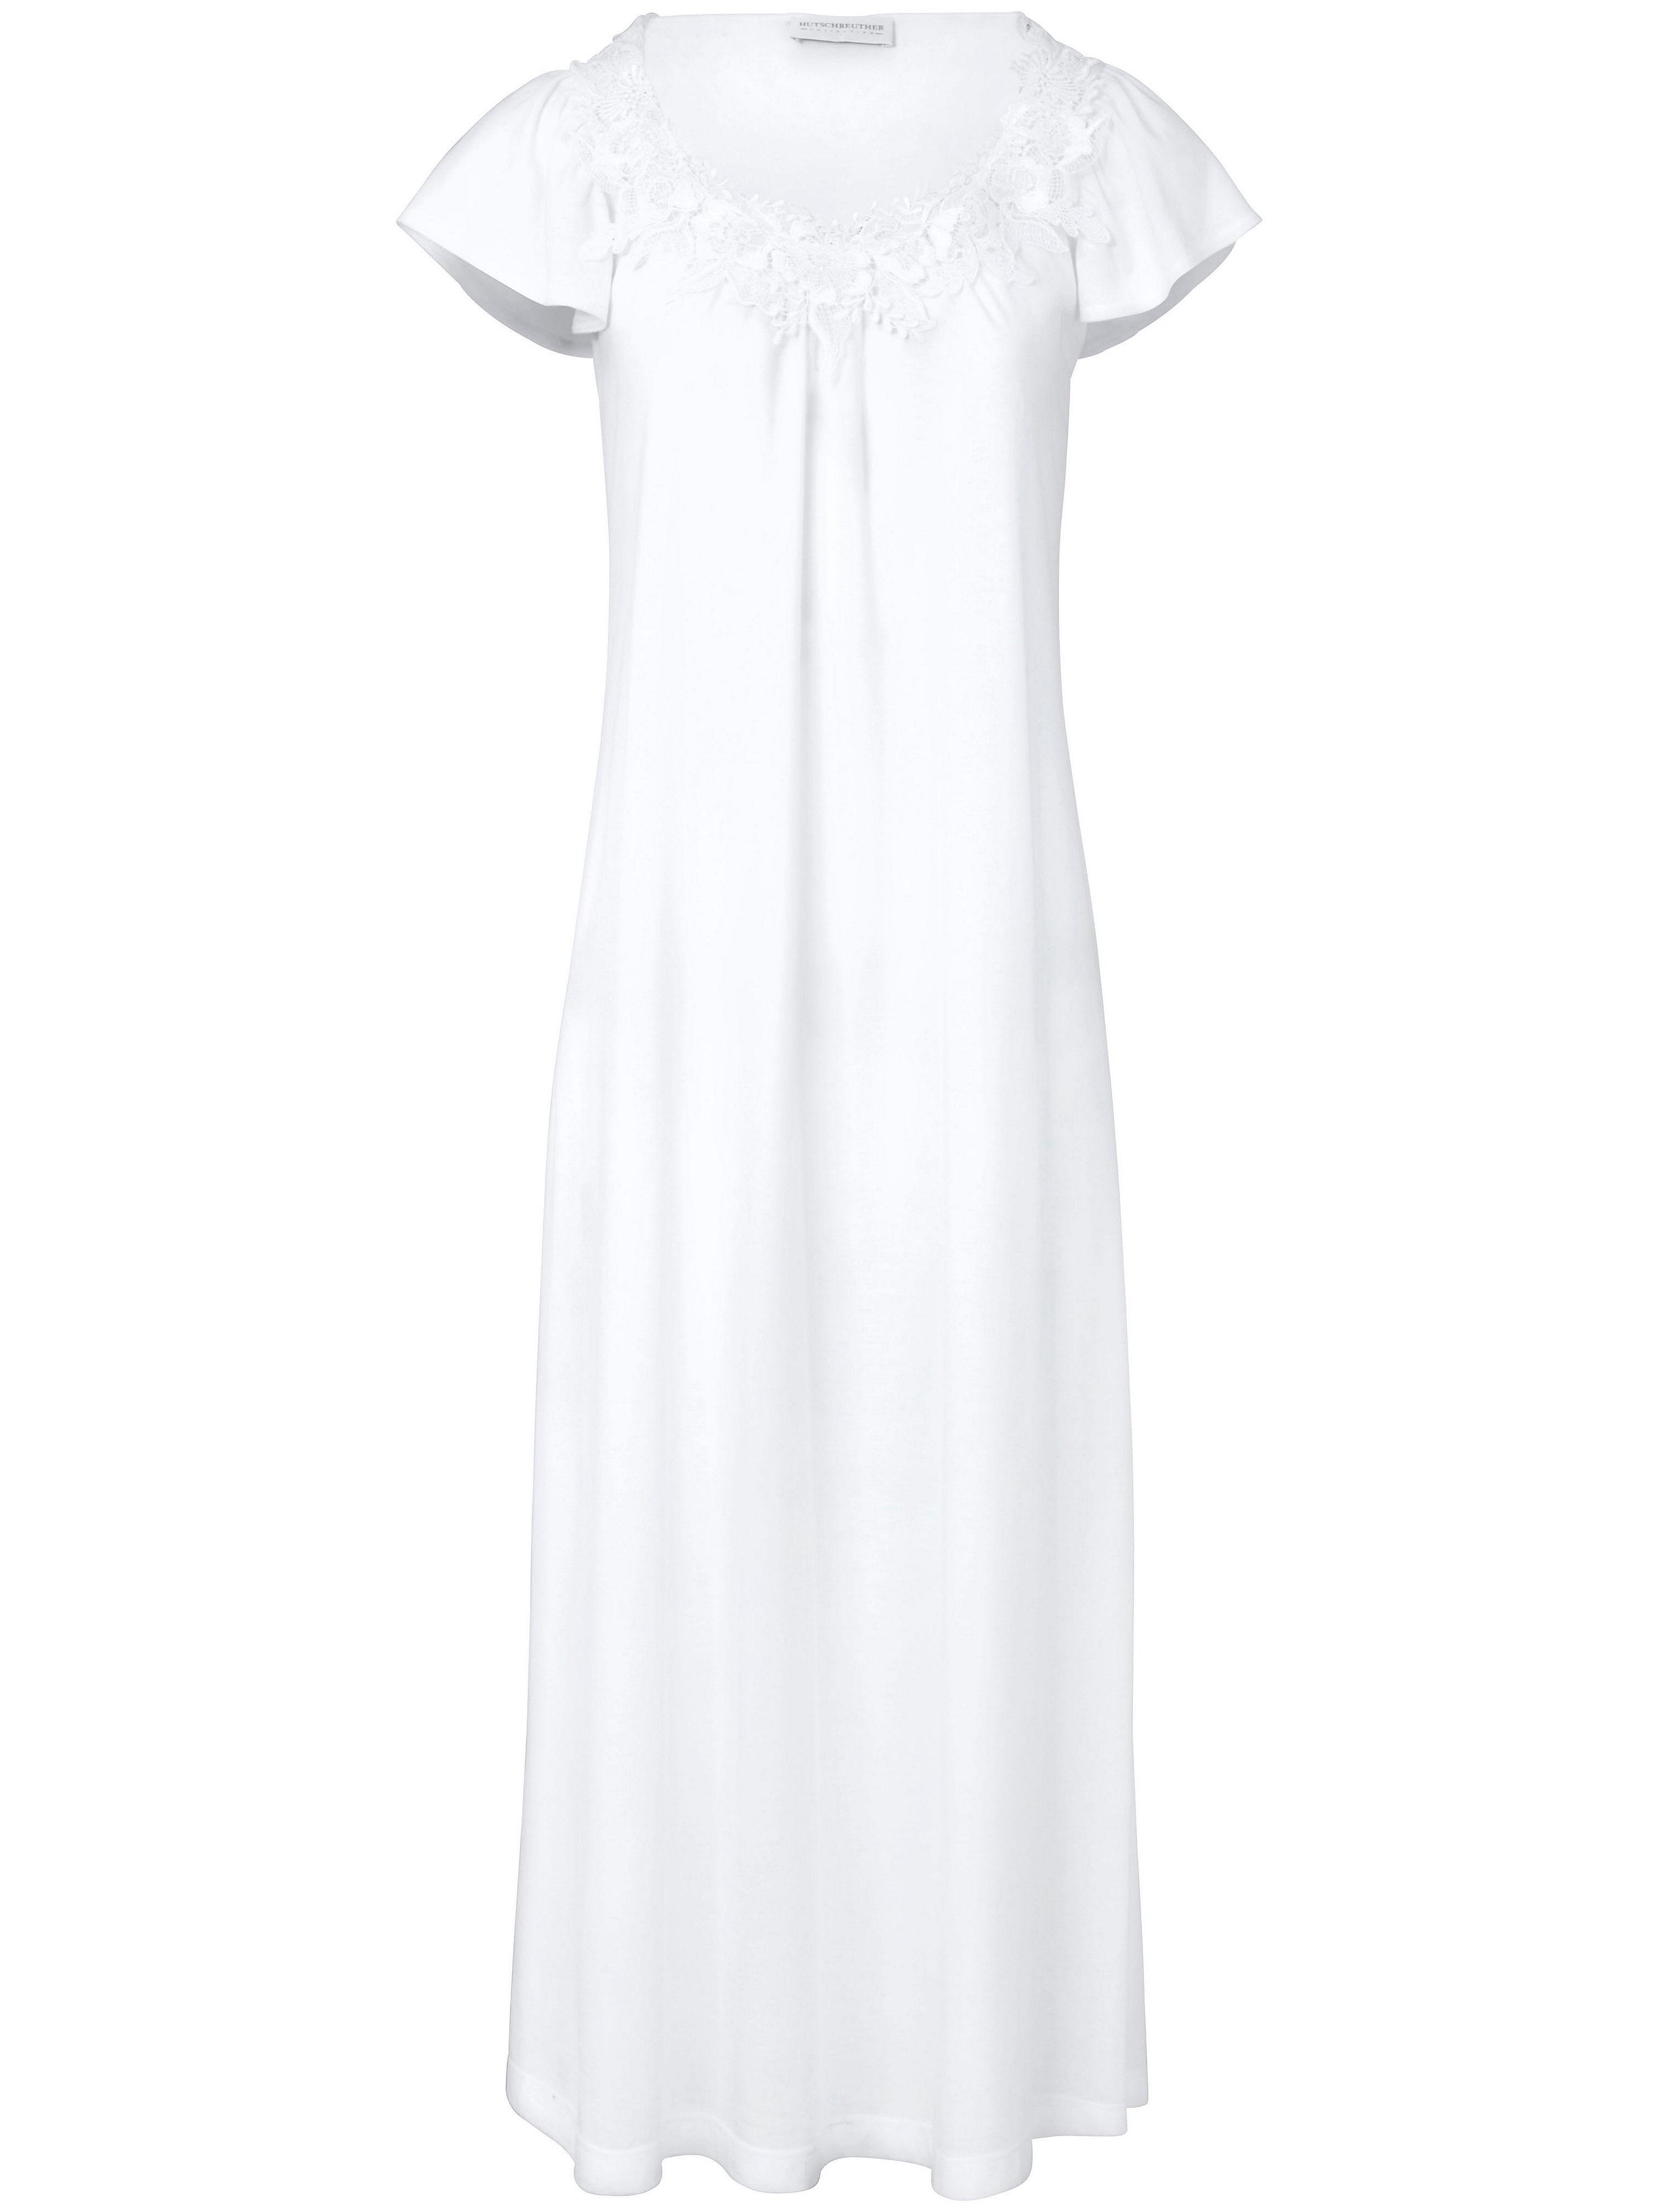 La chemise nuit unie, manches courtes  Hutschreuther blanc taille 44